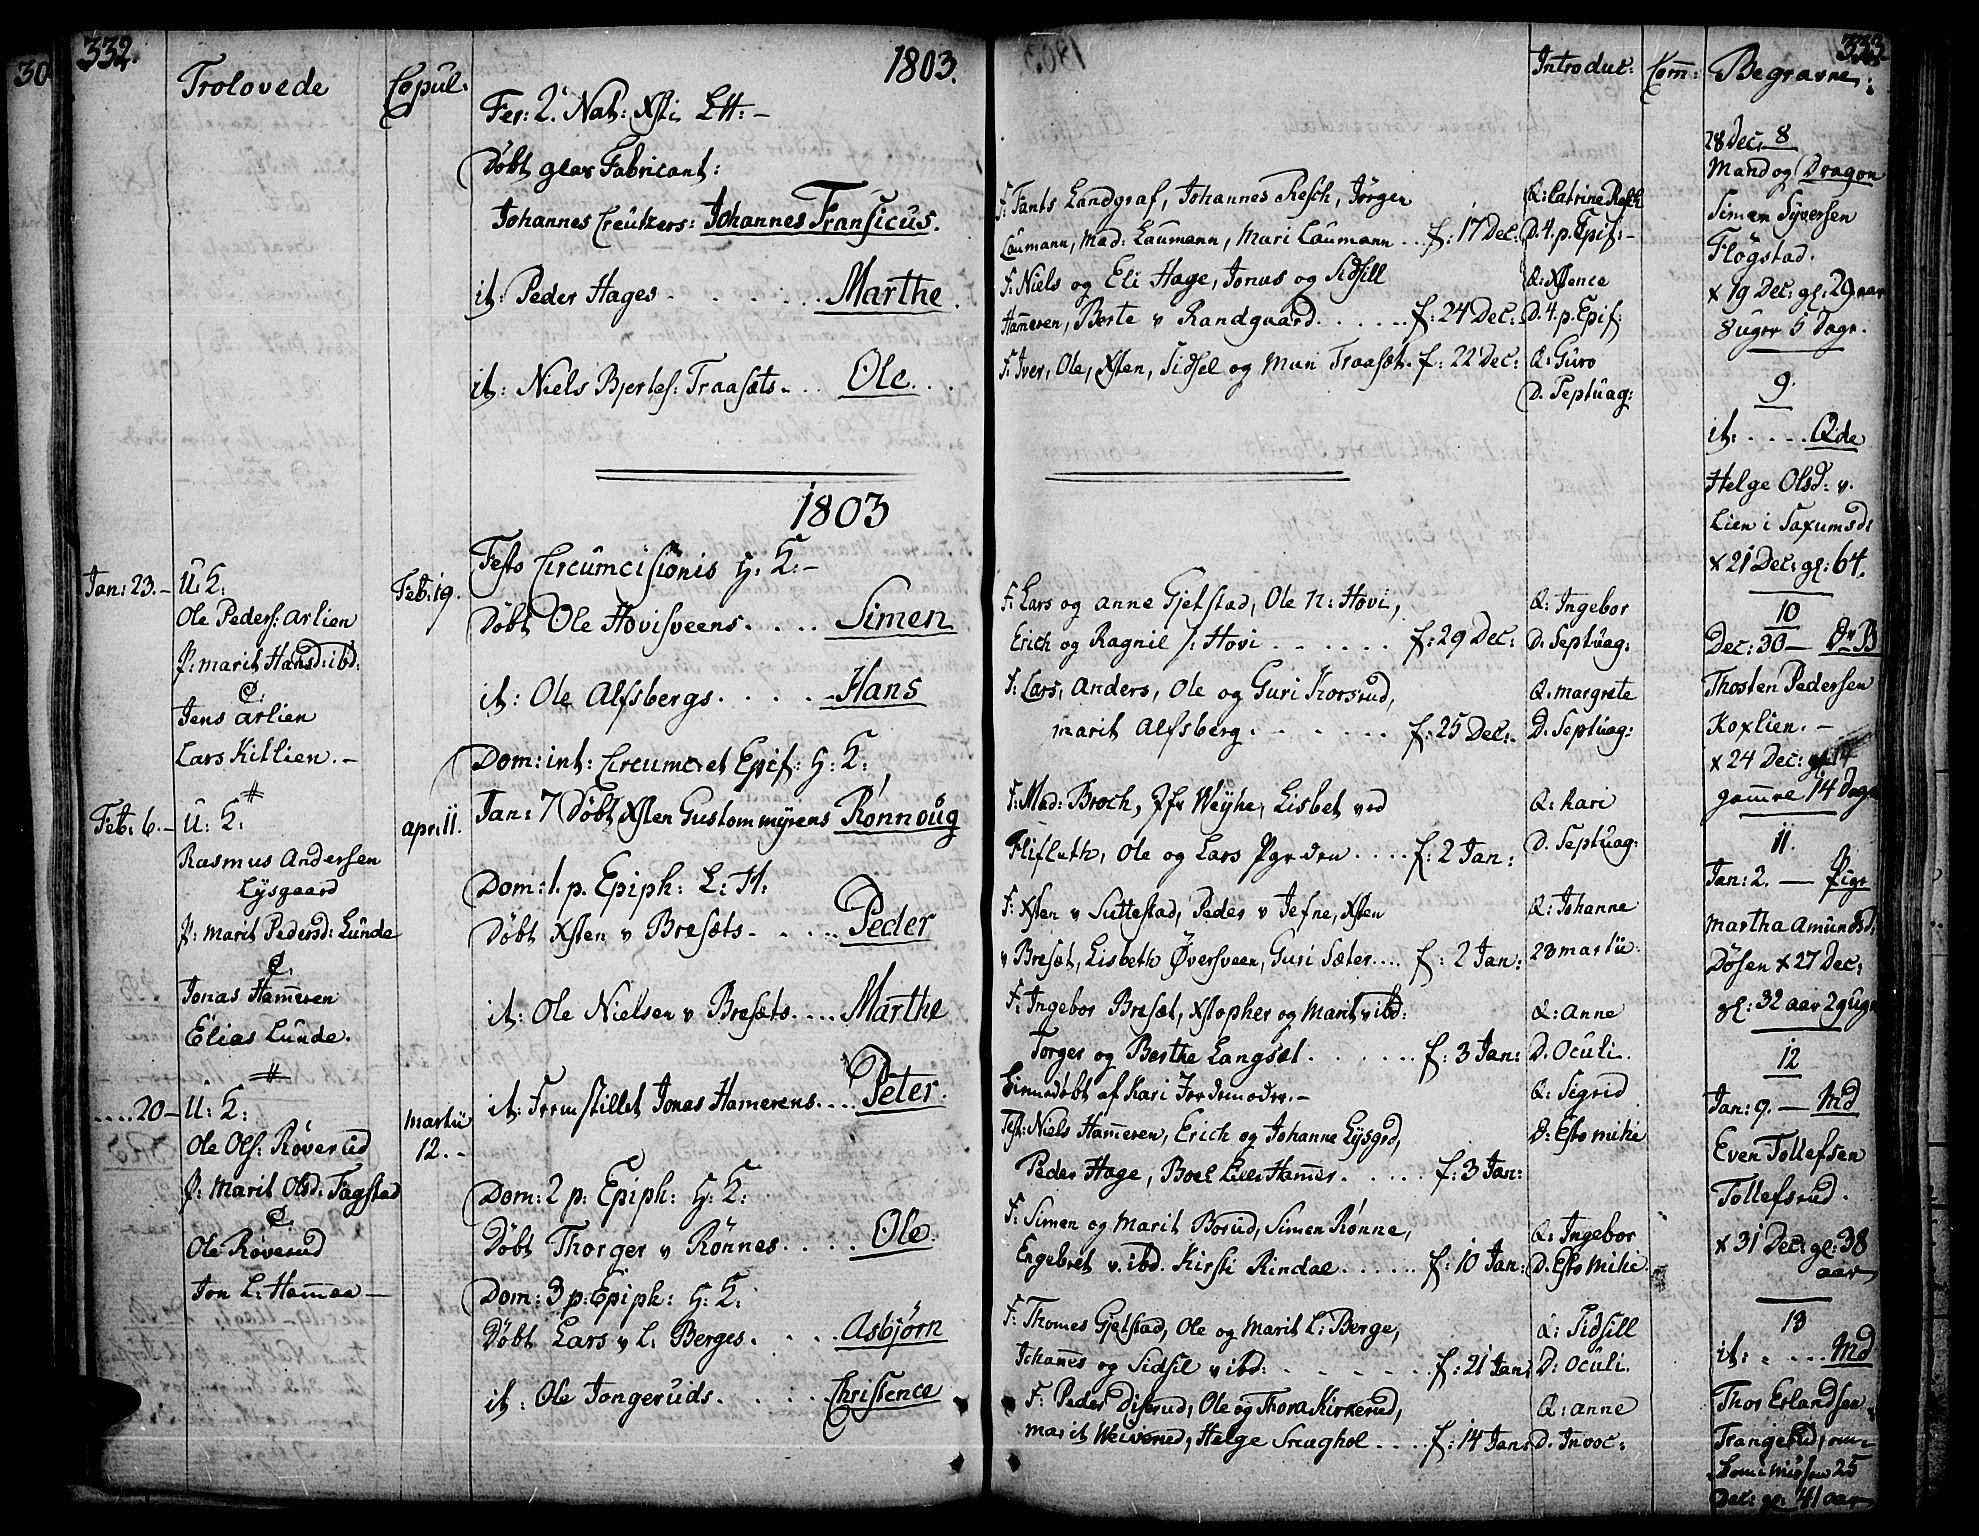 SAH, Fåberg prestekontor, Ministerialbok nr. 2, 1775-1818, s. 332-333